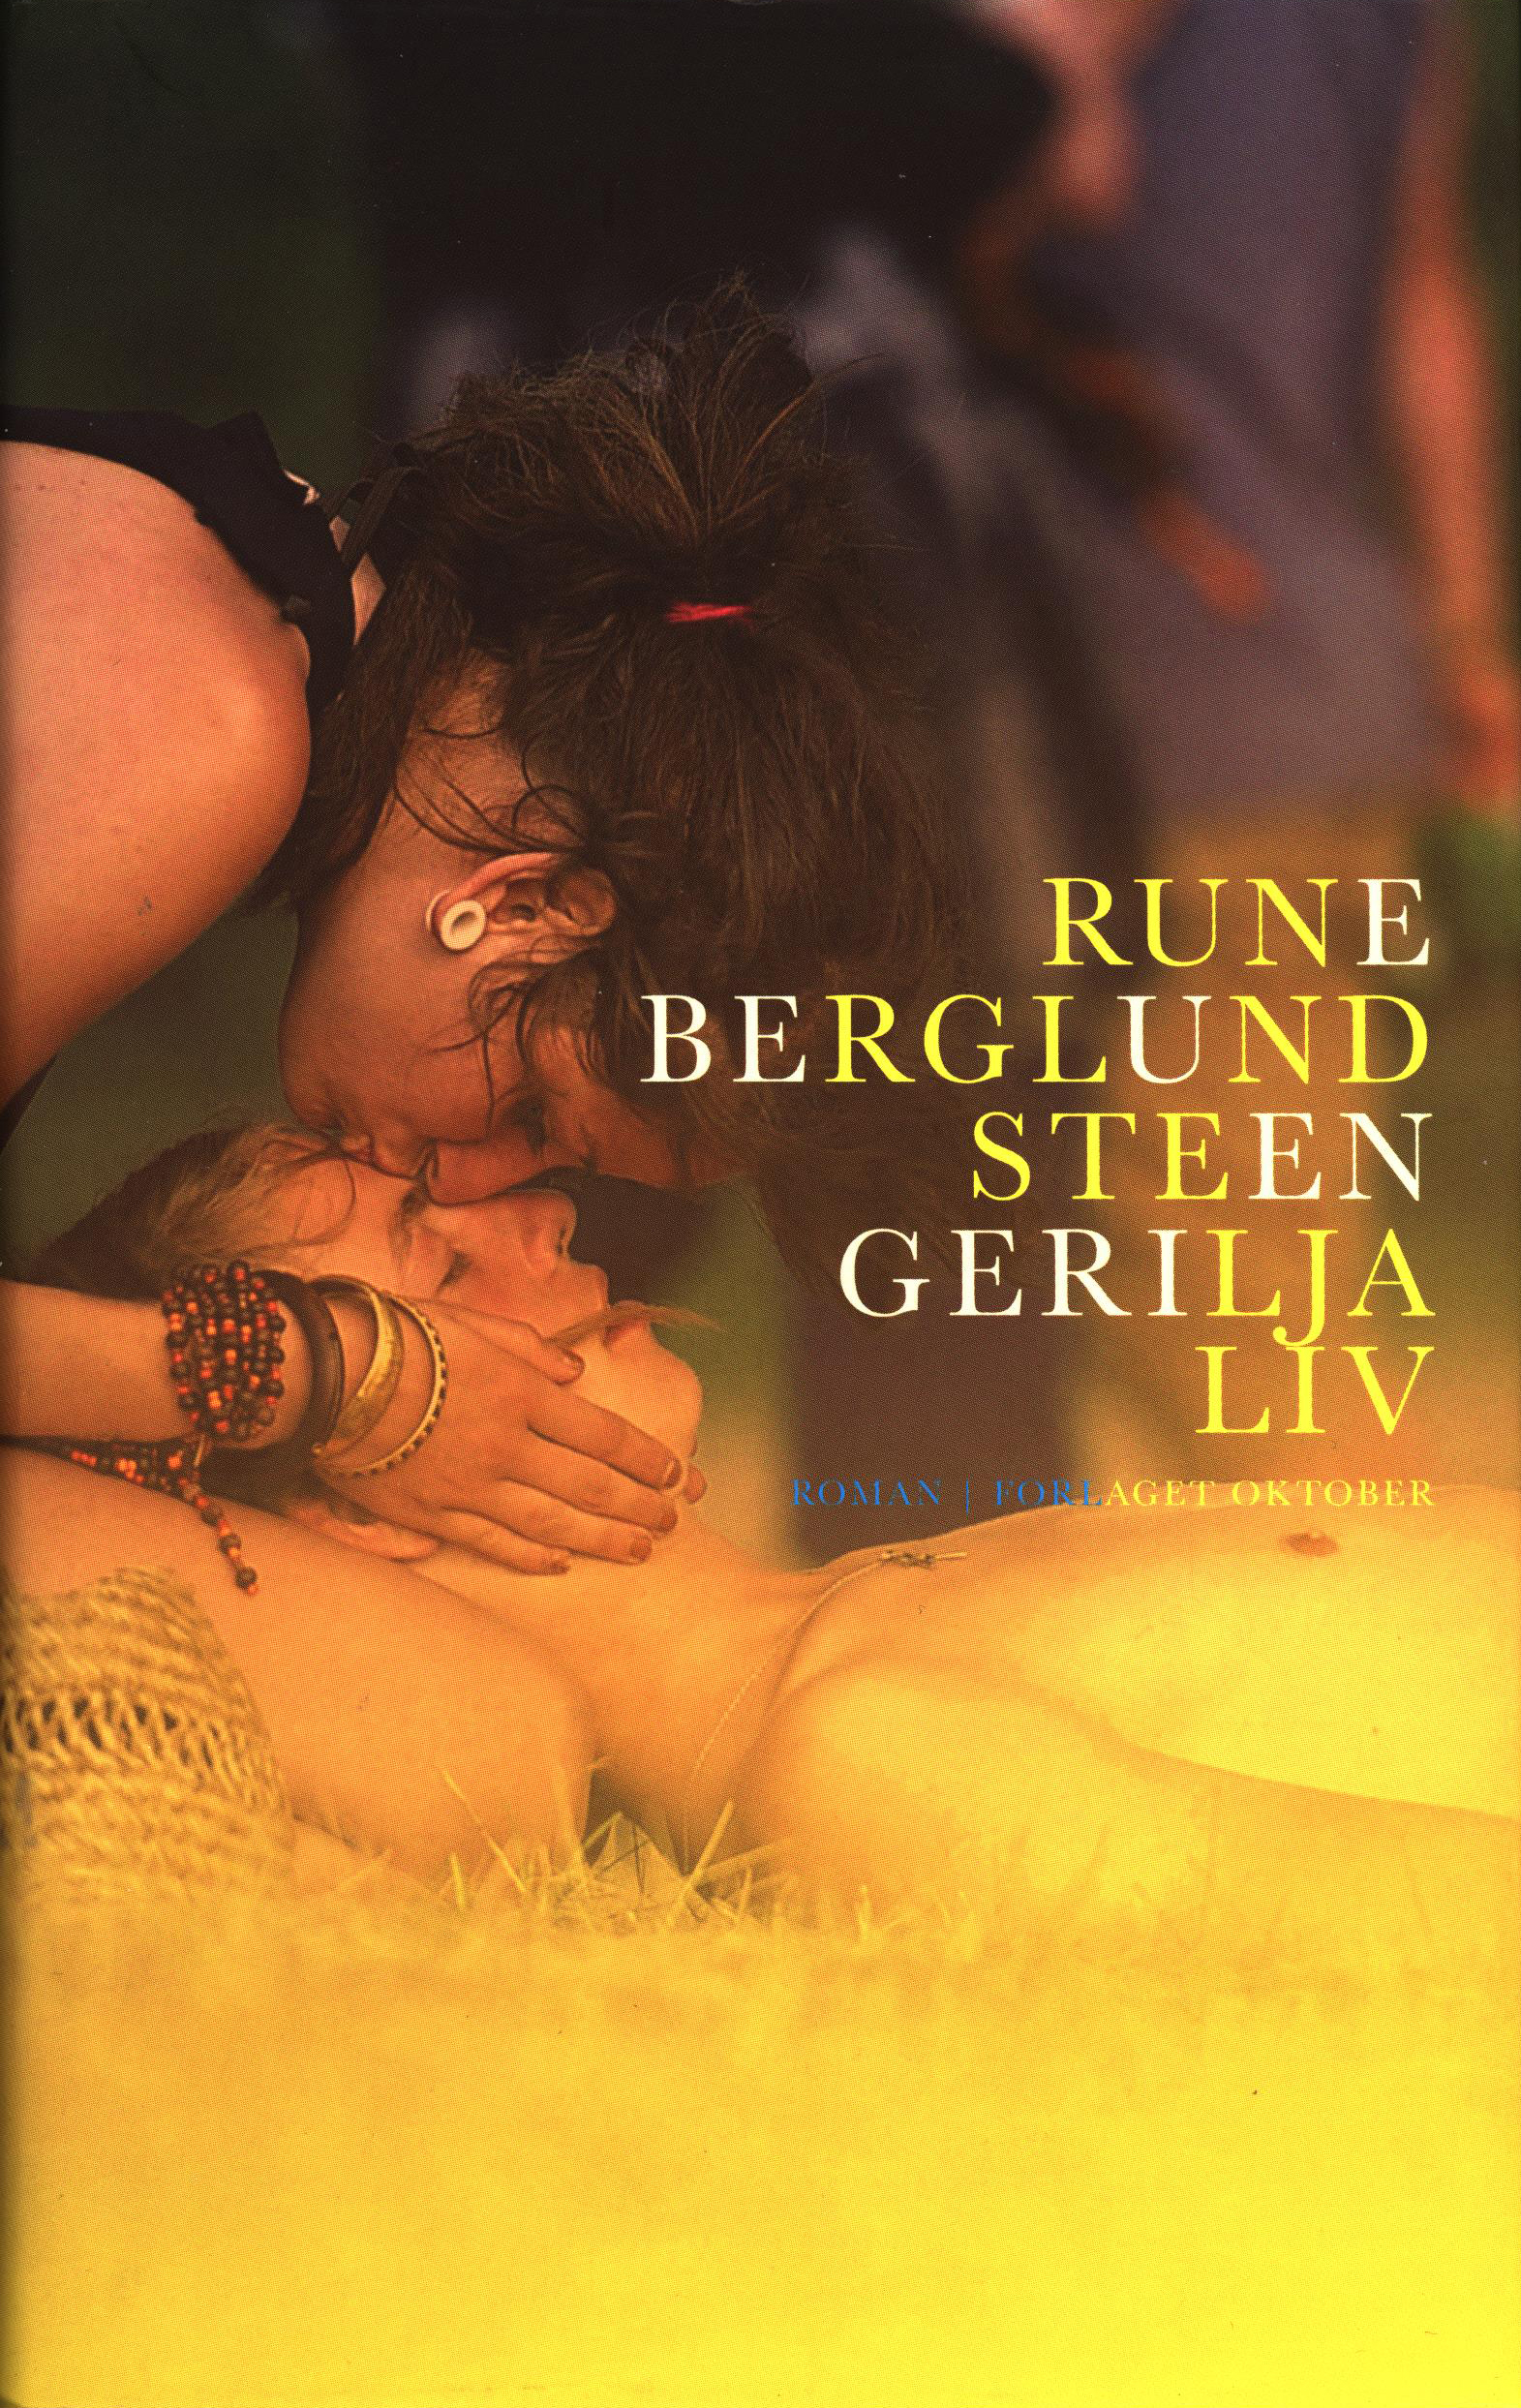 Rune Berglund Steen: Geriljaliv